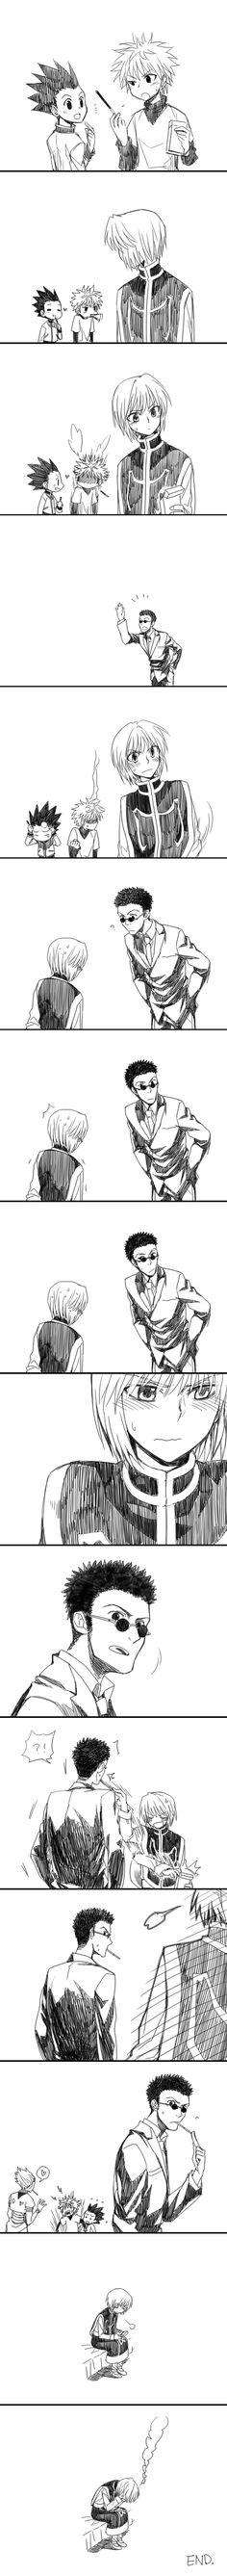 Aww Kurapika, but Hisoka in the background    Ahhhhh I loved this anime so much!!!!! #HunterXHunter (if u were wondering the name)